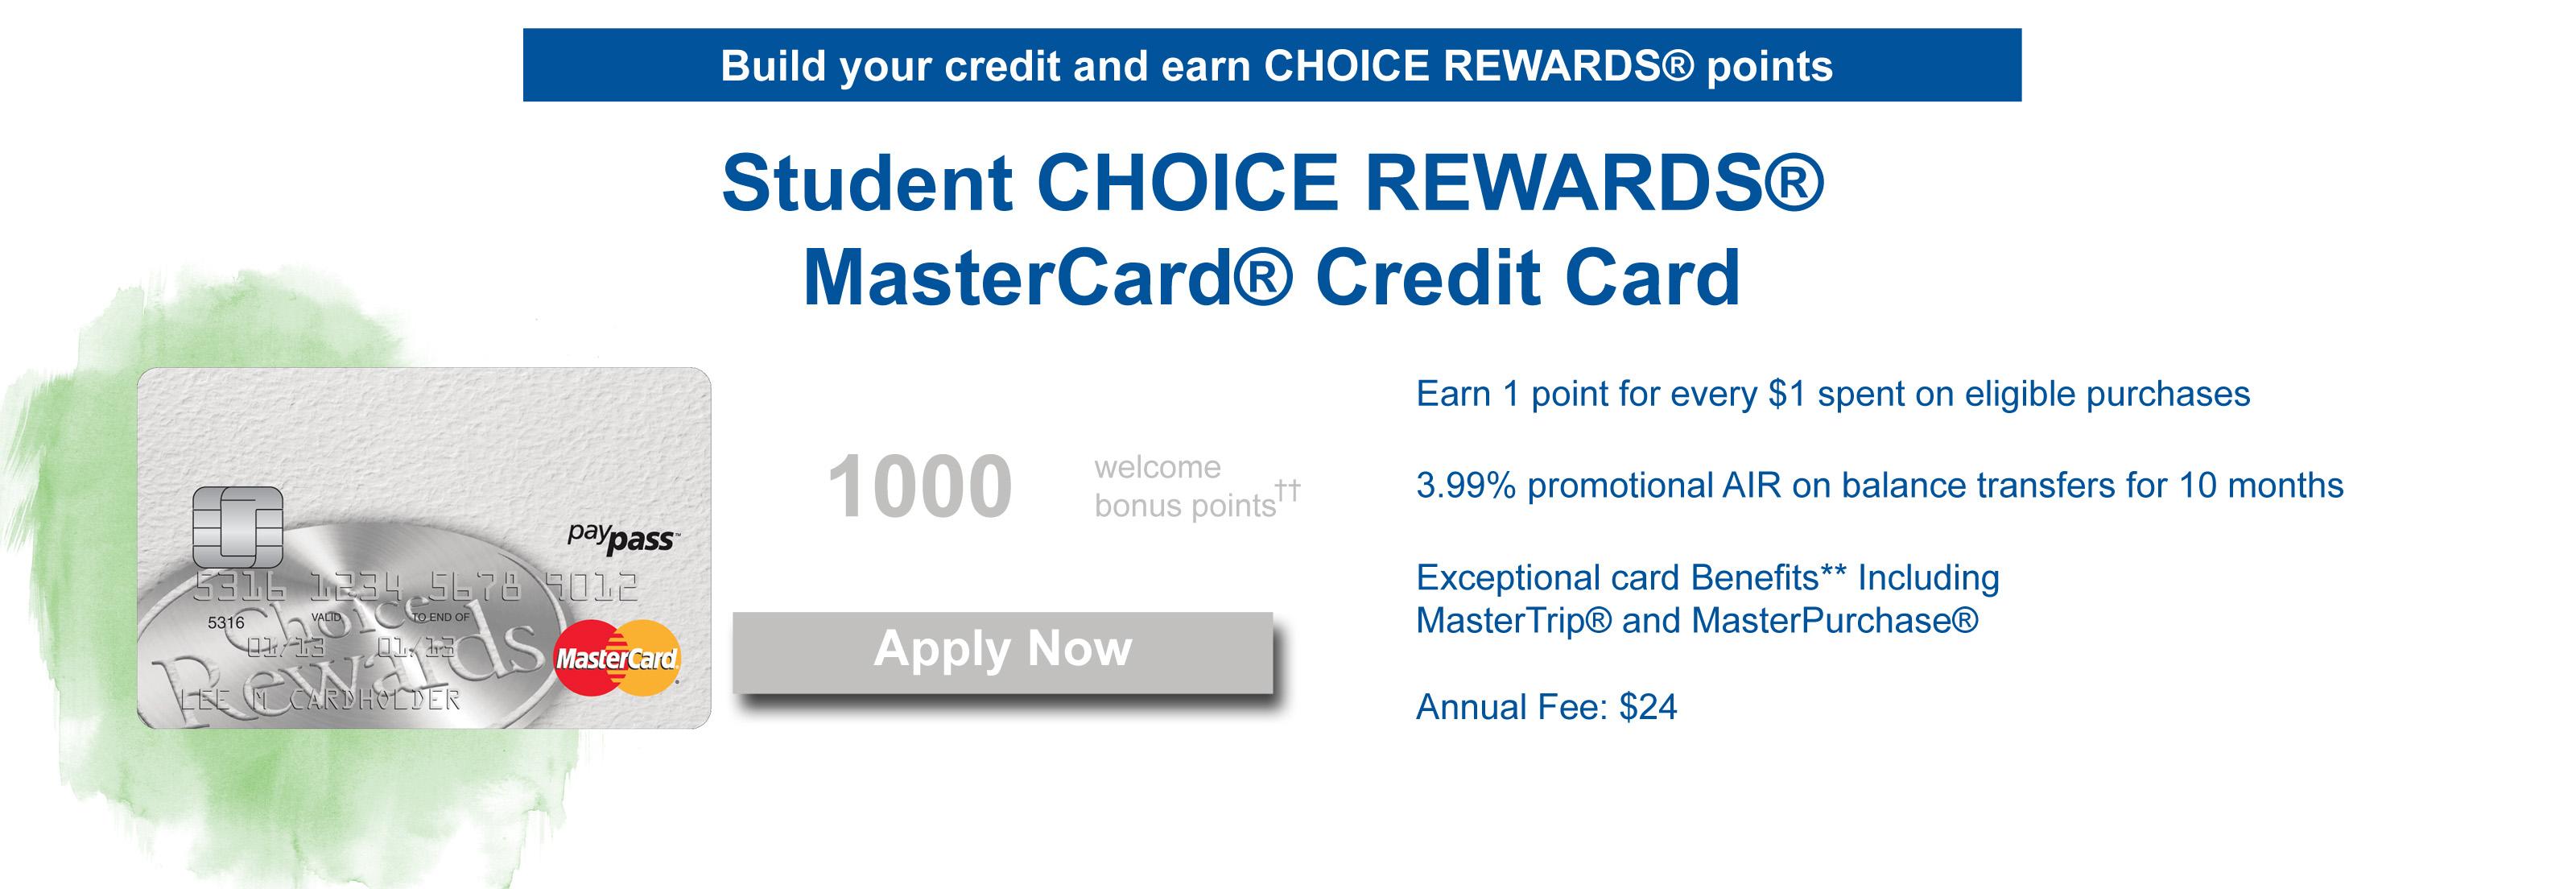 student choice rewards